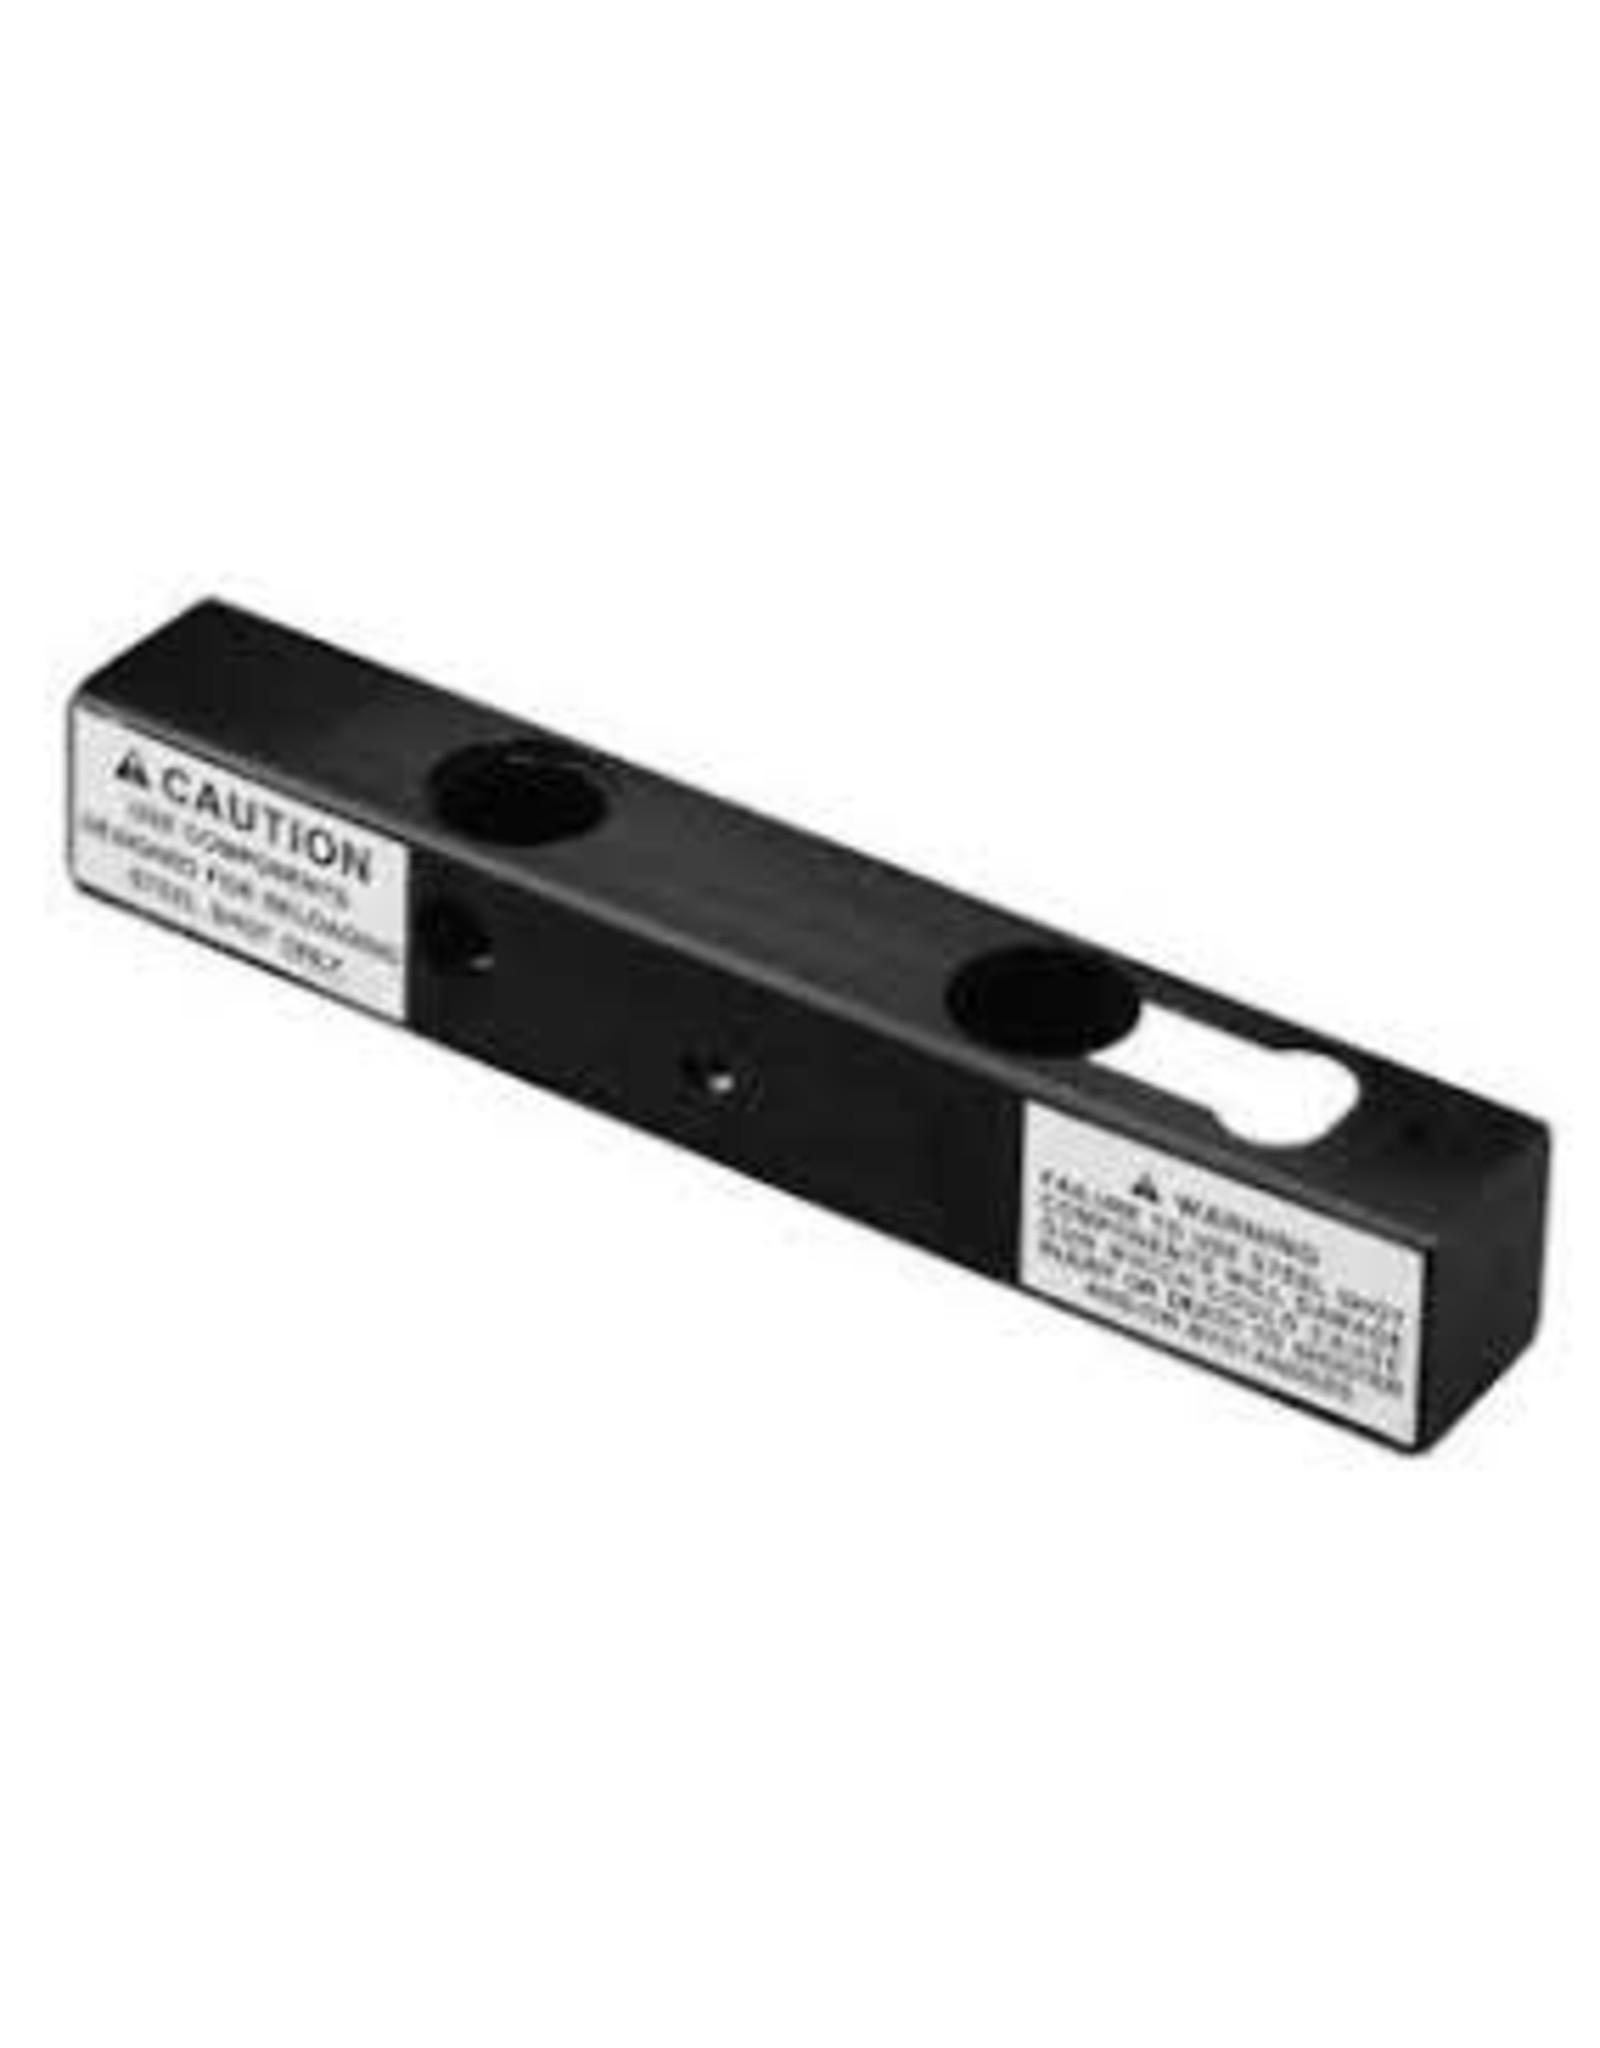 MEC MEC Steel Shot Charge Bar 7/8 OZ